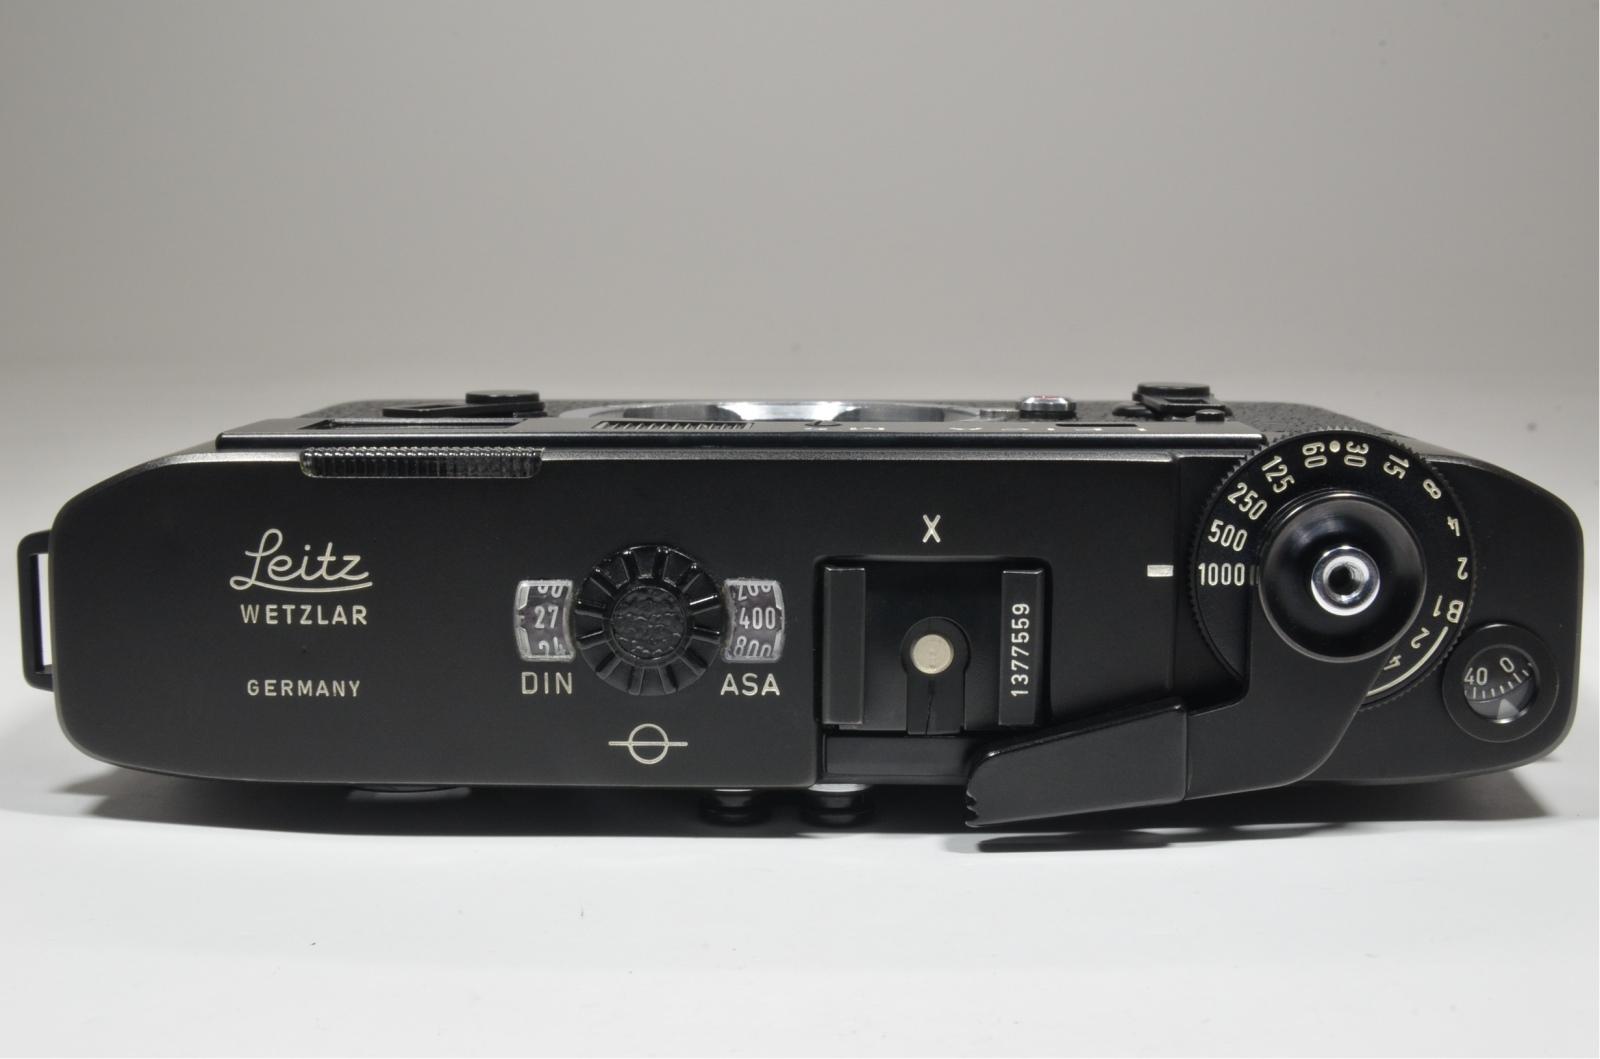 leica m5 black 3 lug year 1973 s/n 1377559 rangefinder camera